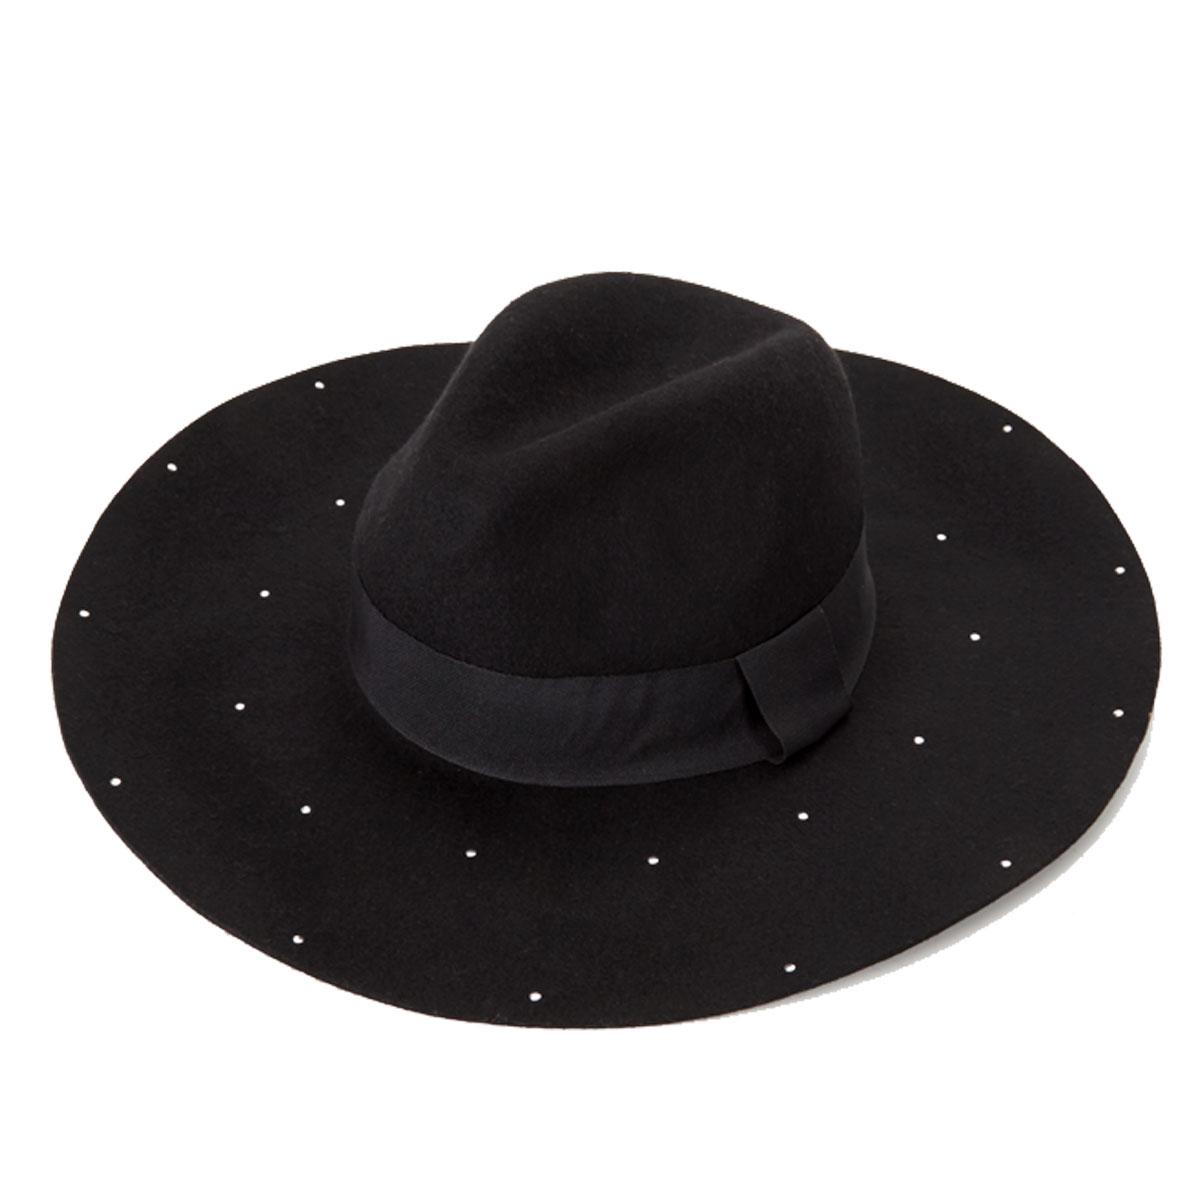 Stud Detail Floppy Hat.